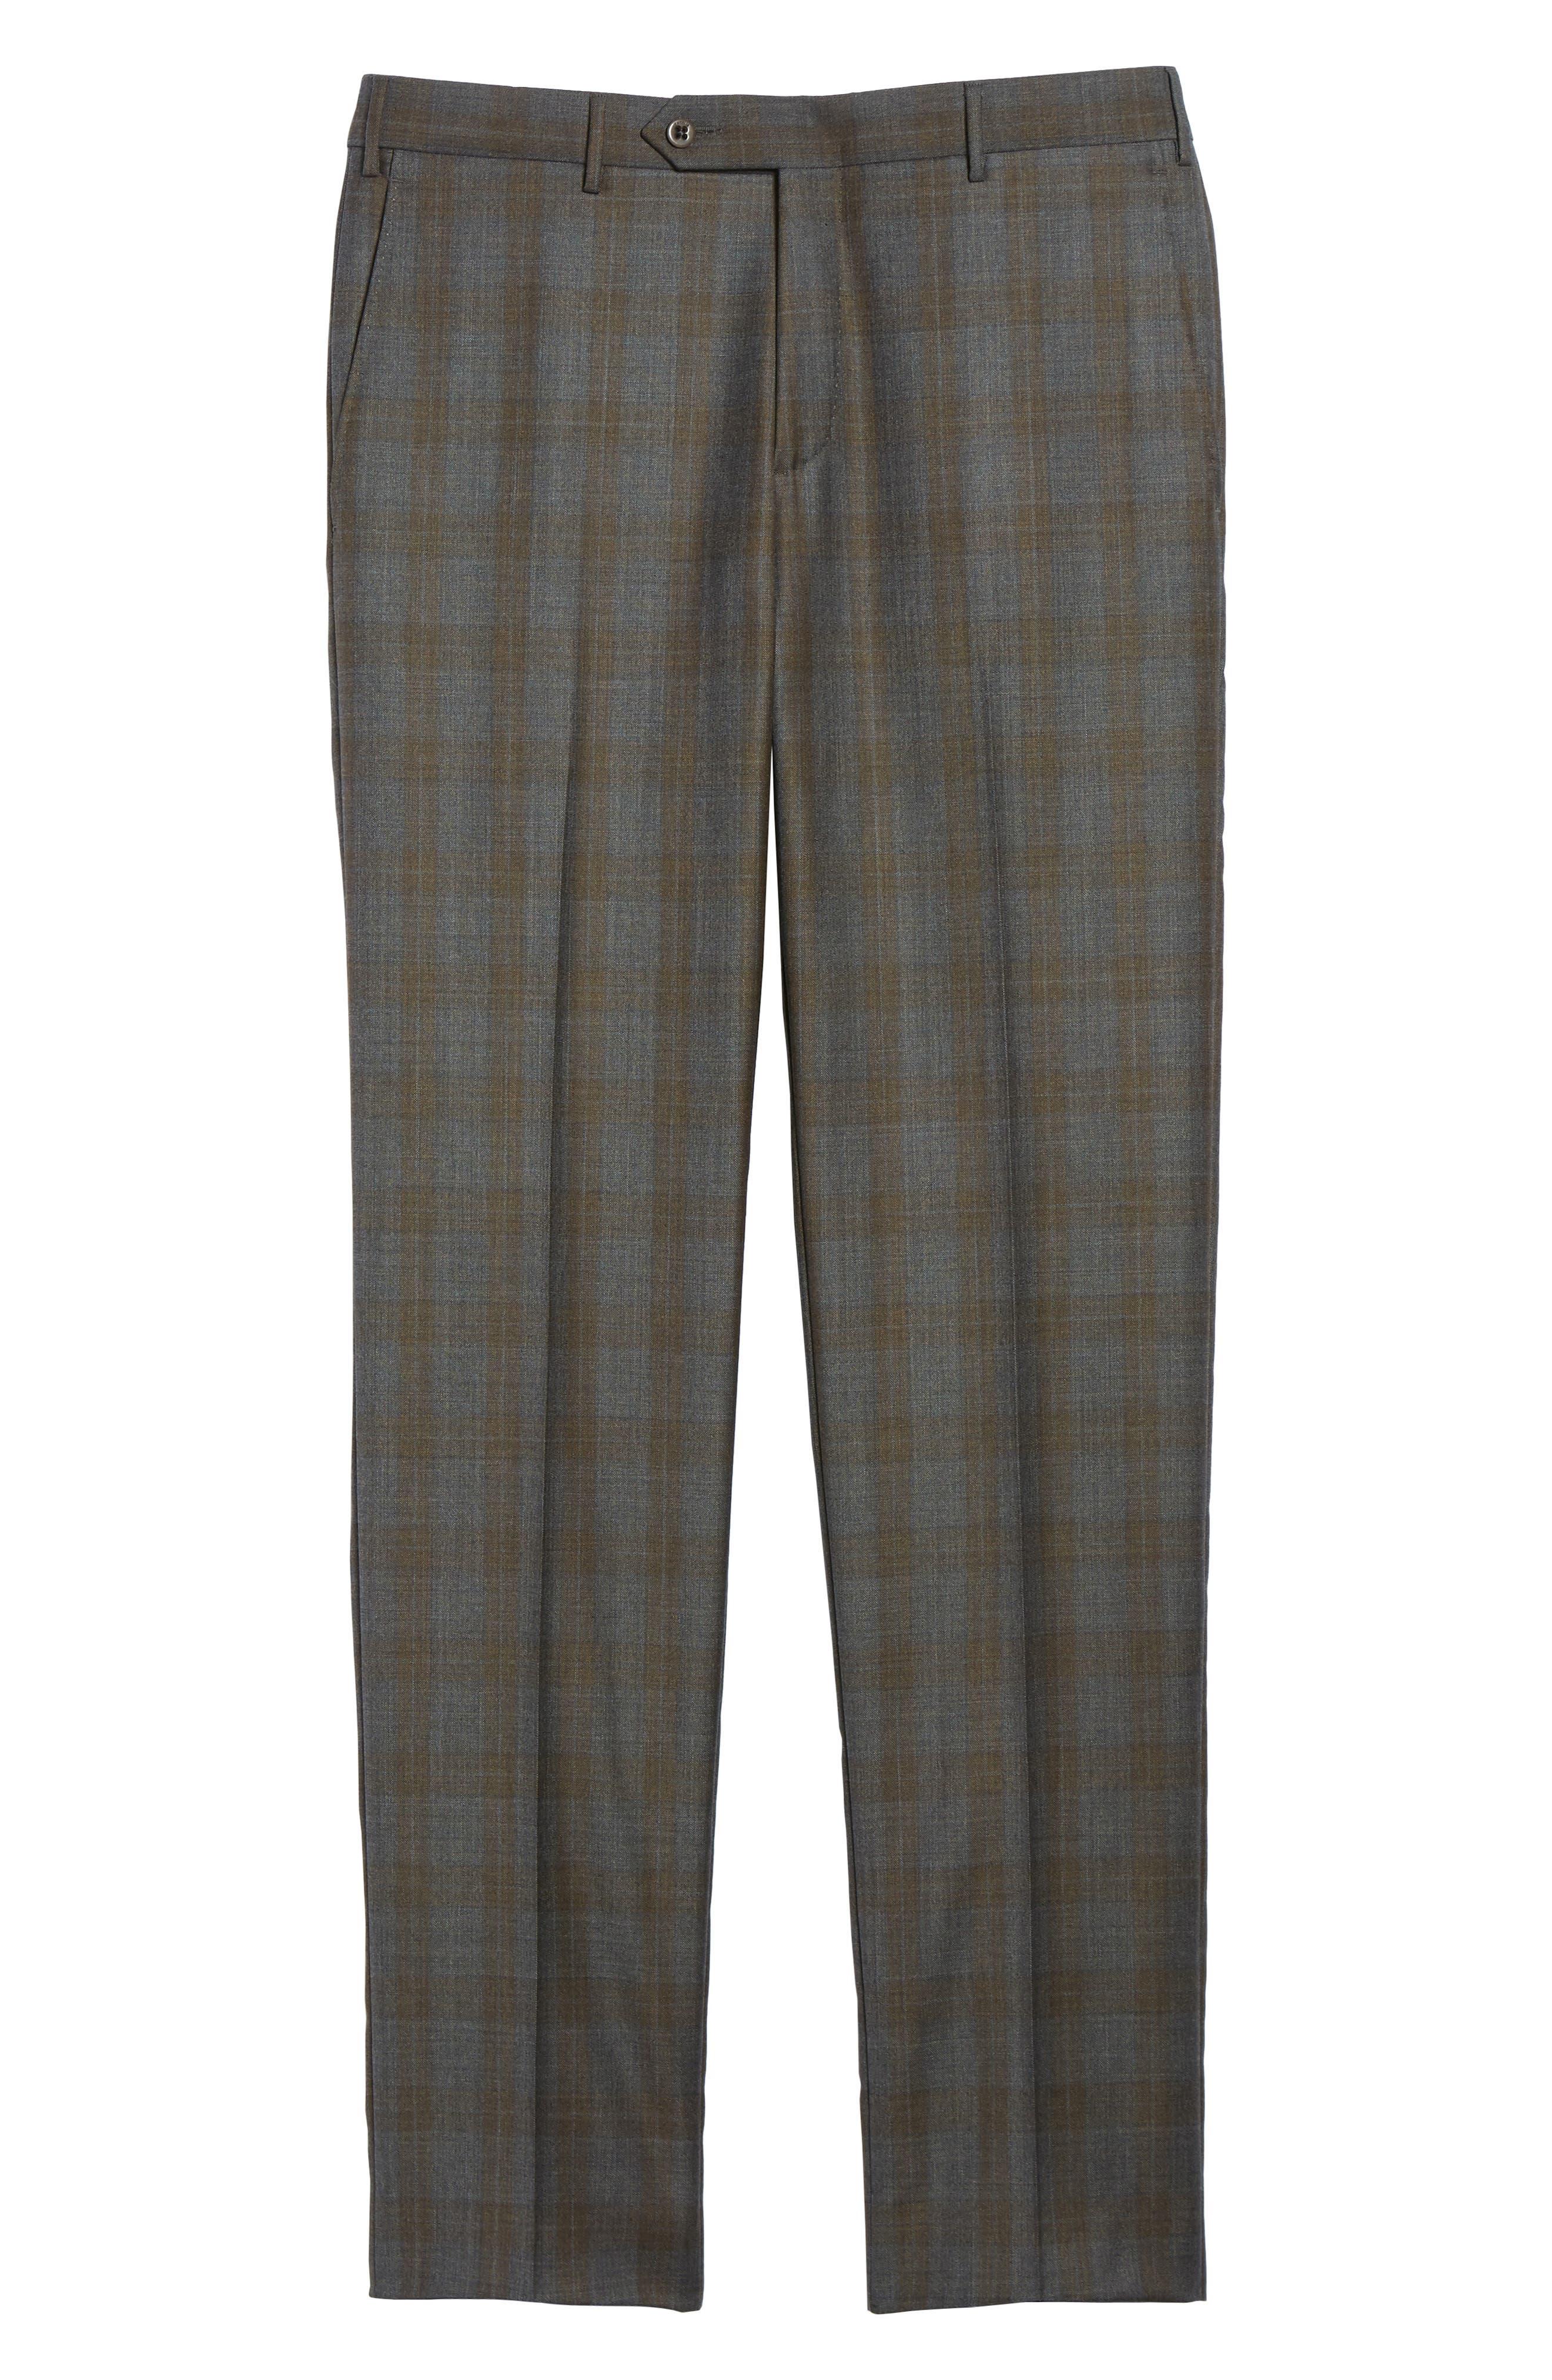 Parker Flat Front Plaid Wool Trousers,                             Alternate thumbnail 6, color,                             021